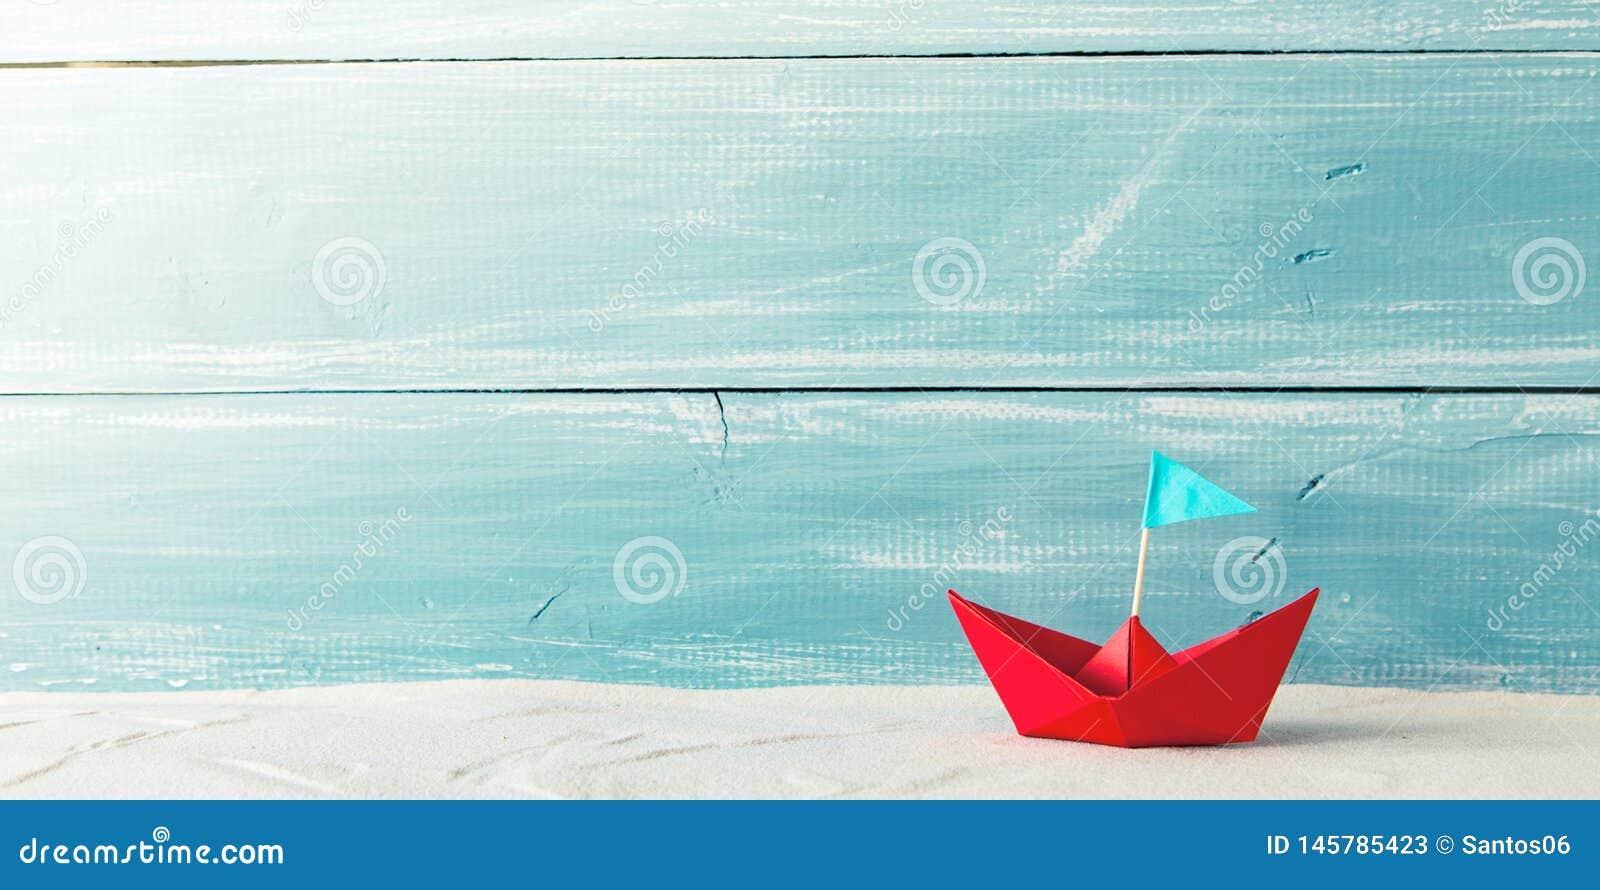 Maritime background